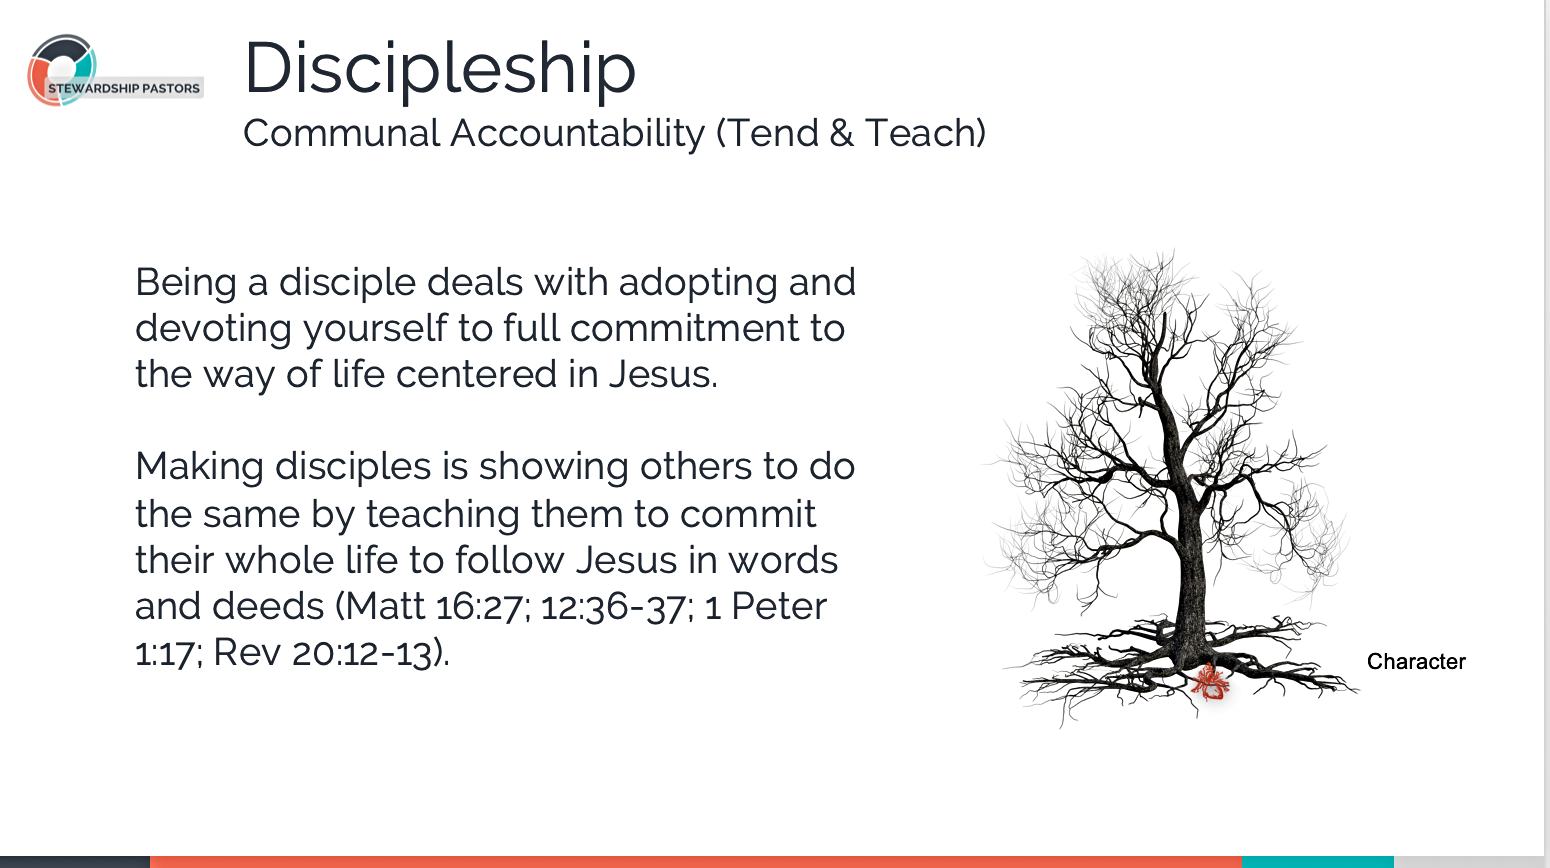 Communal Accountability